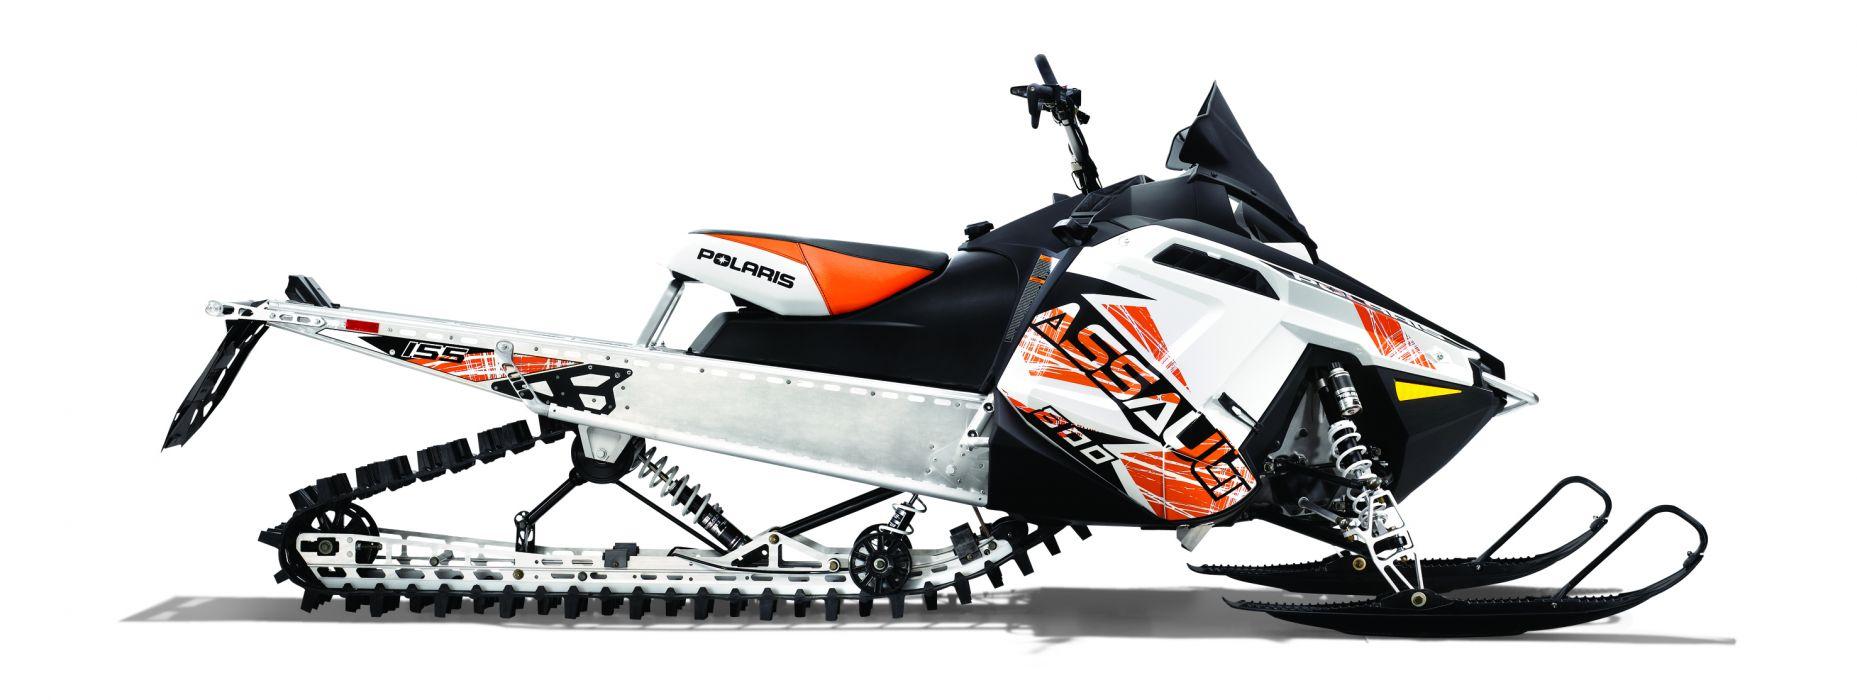 POLARIS RMK ASSAULT snowmobile winter sled snow   k wallpaper